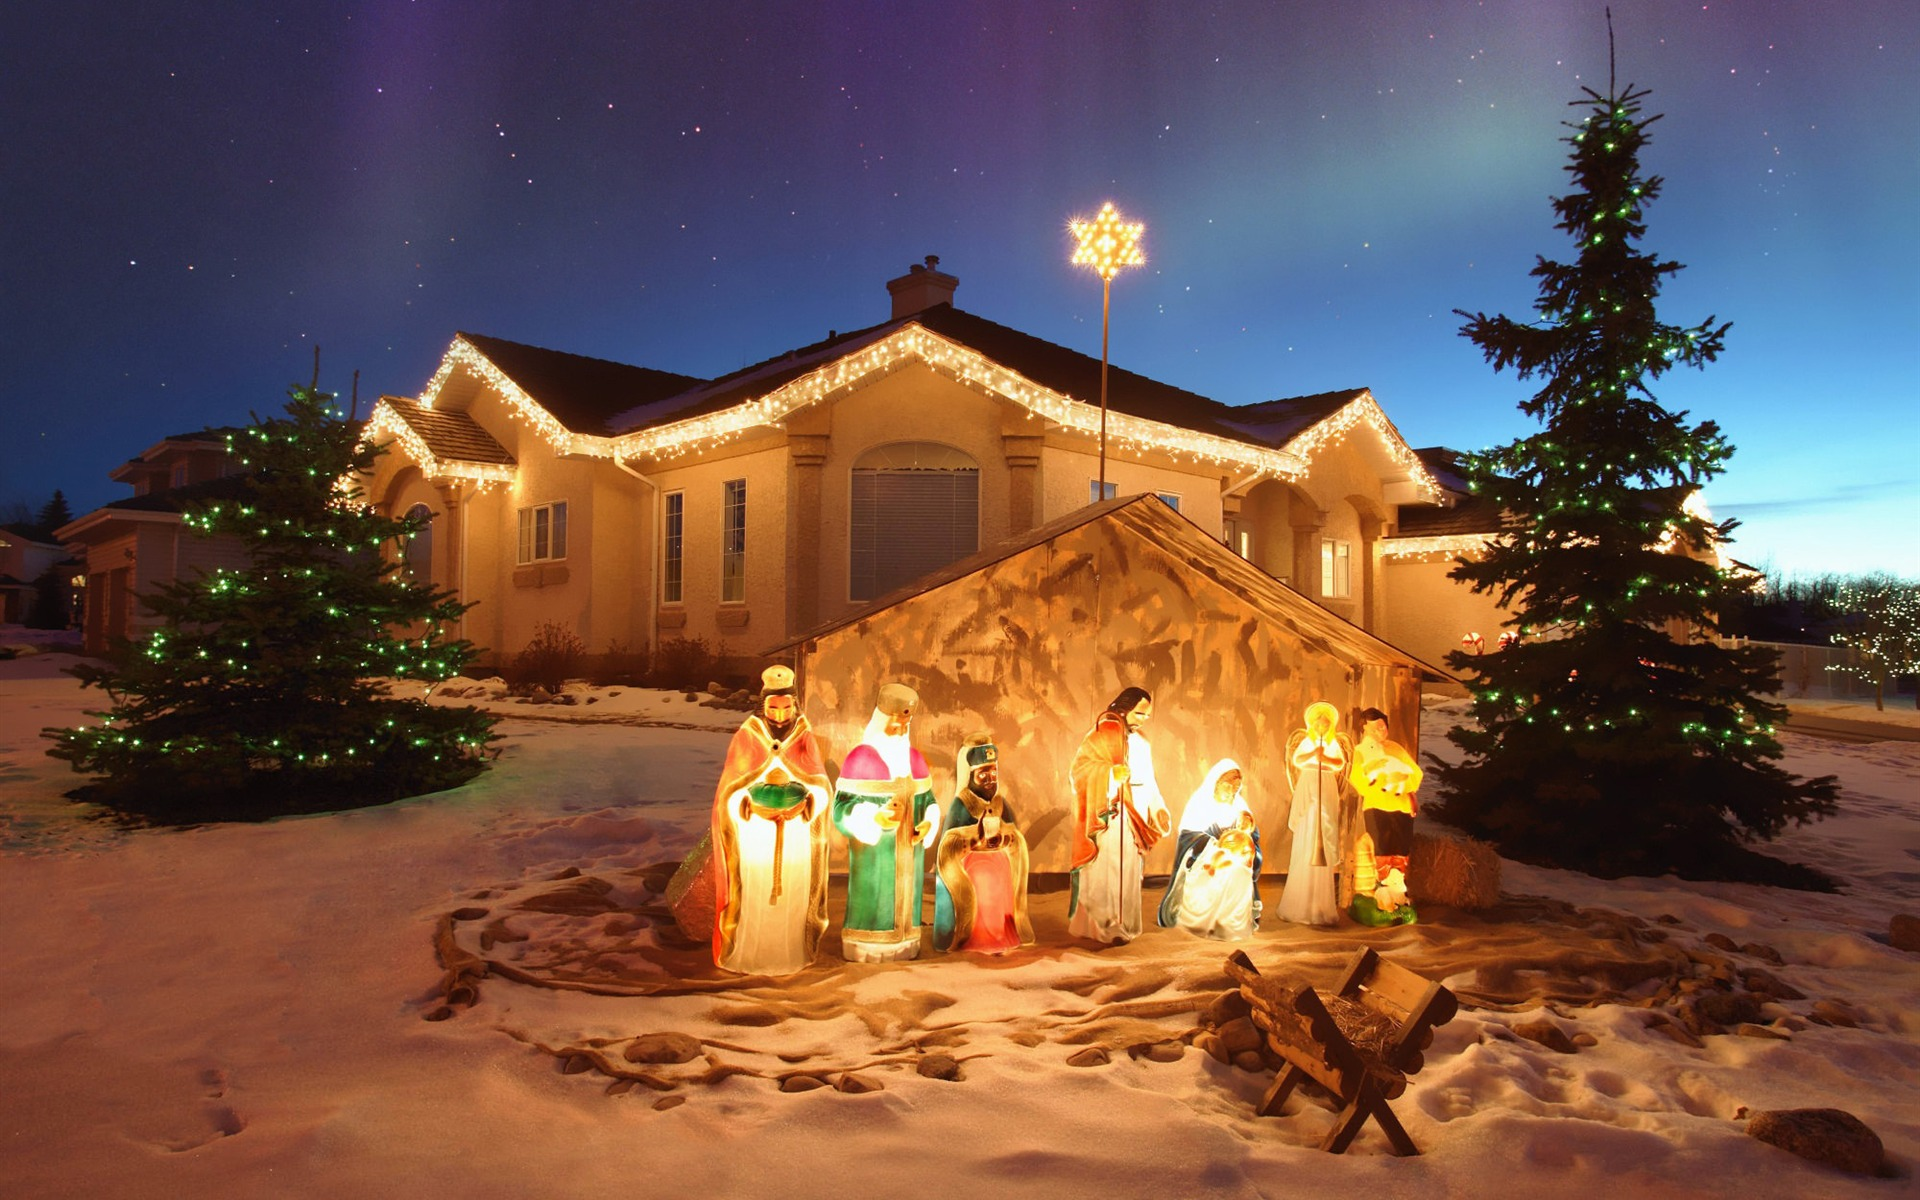 Christmas Nativity Set Outdoor.Outdoor Christmas Nativity Scene Merry Christmas Desktop